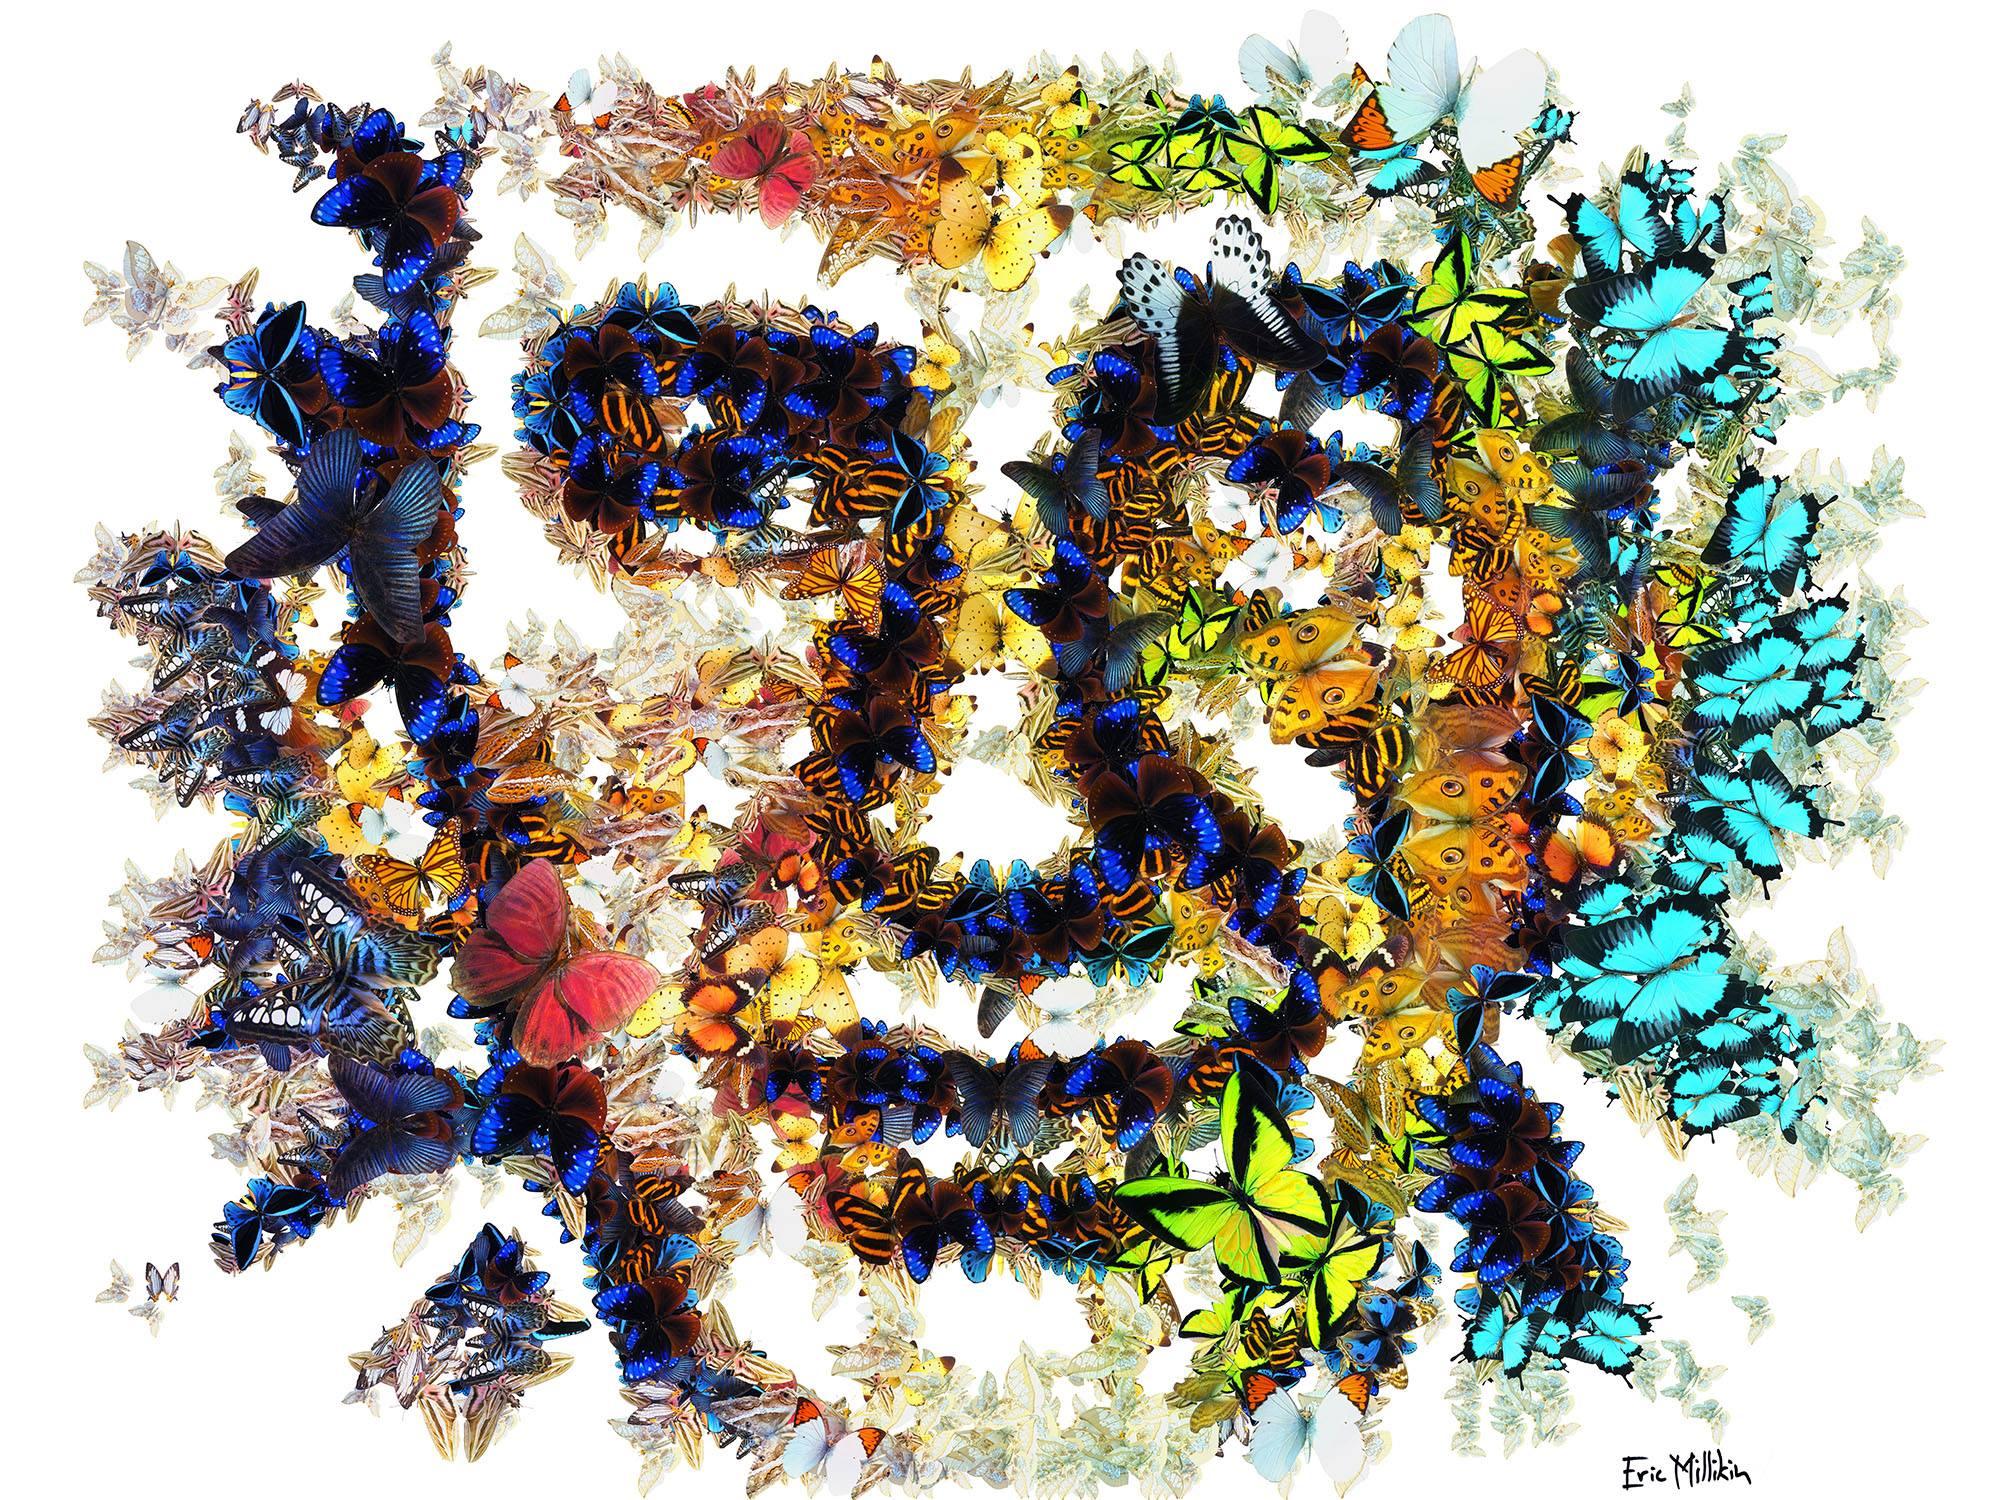 Elie Wiesel (Sept. 30, 1928 – July 2, 2016)